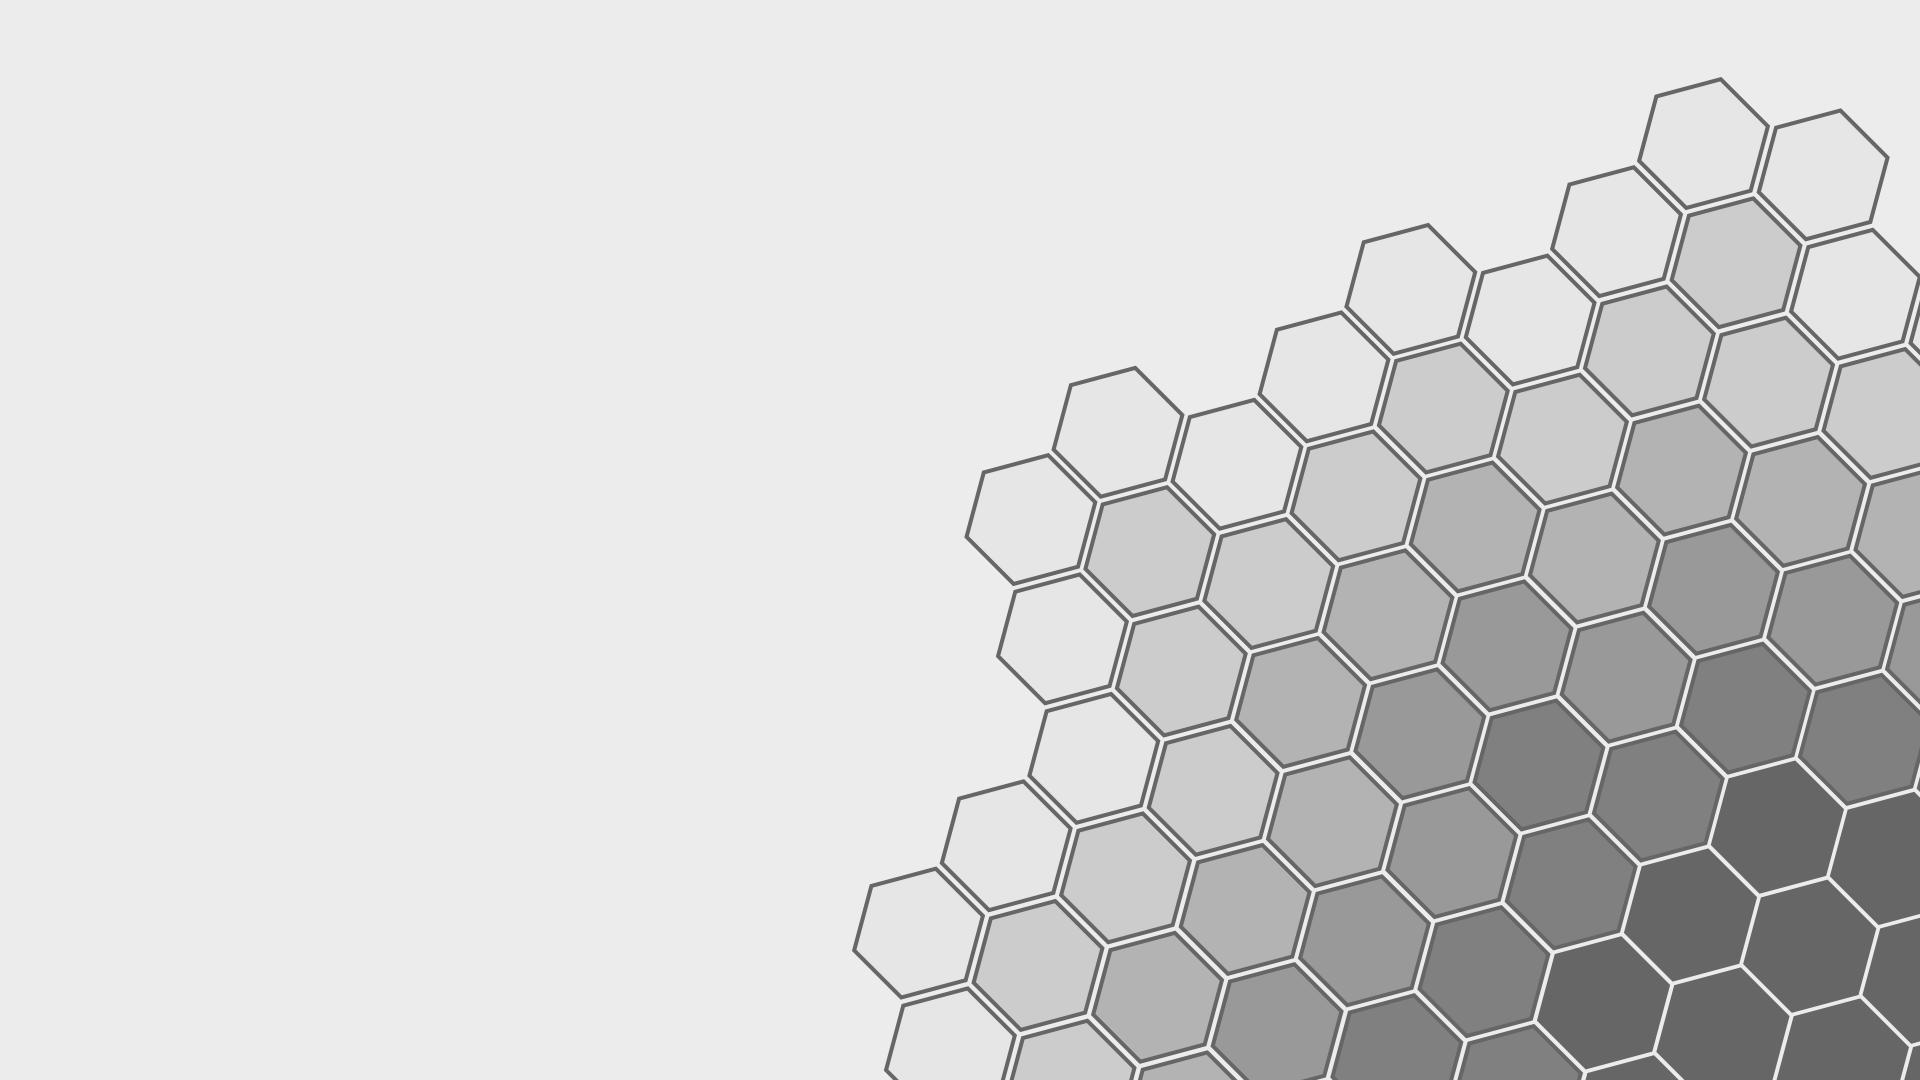 Wallpaper Minimalism Geometry Hexagon Simple Background